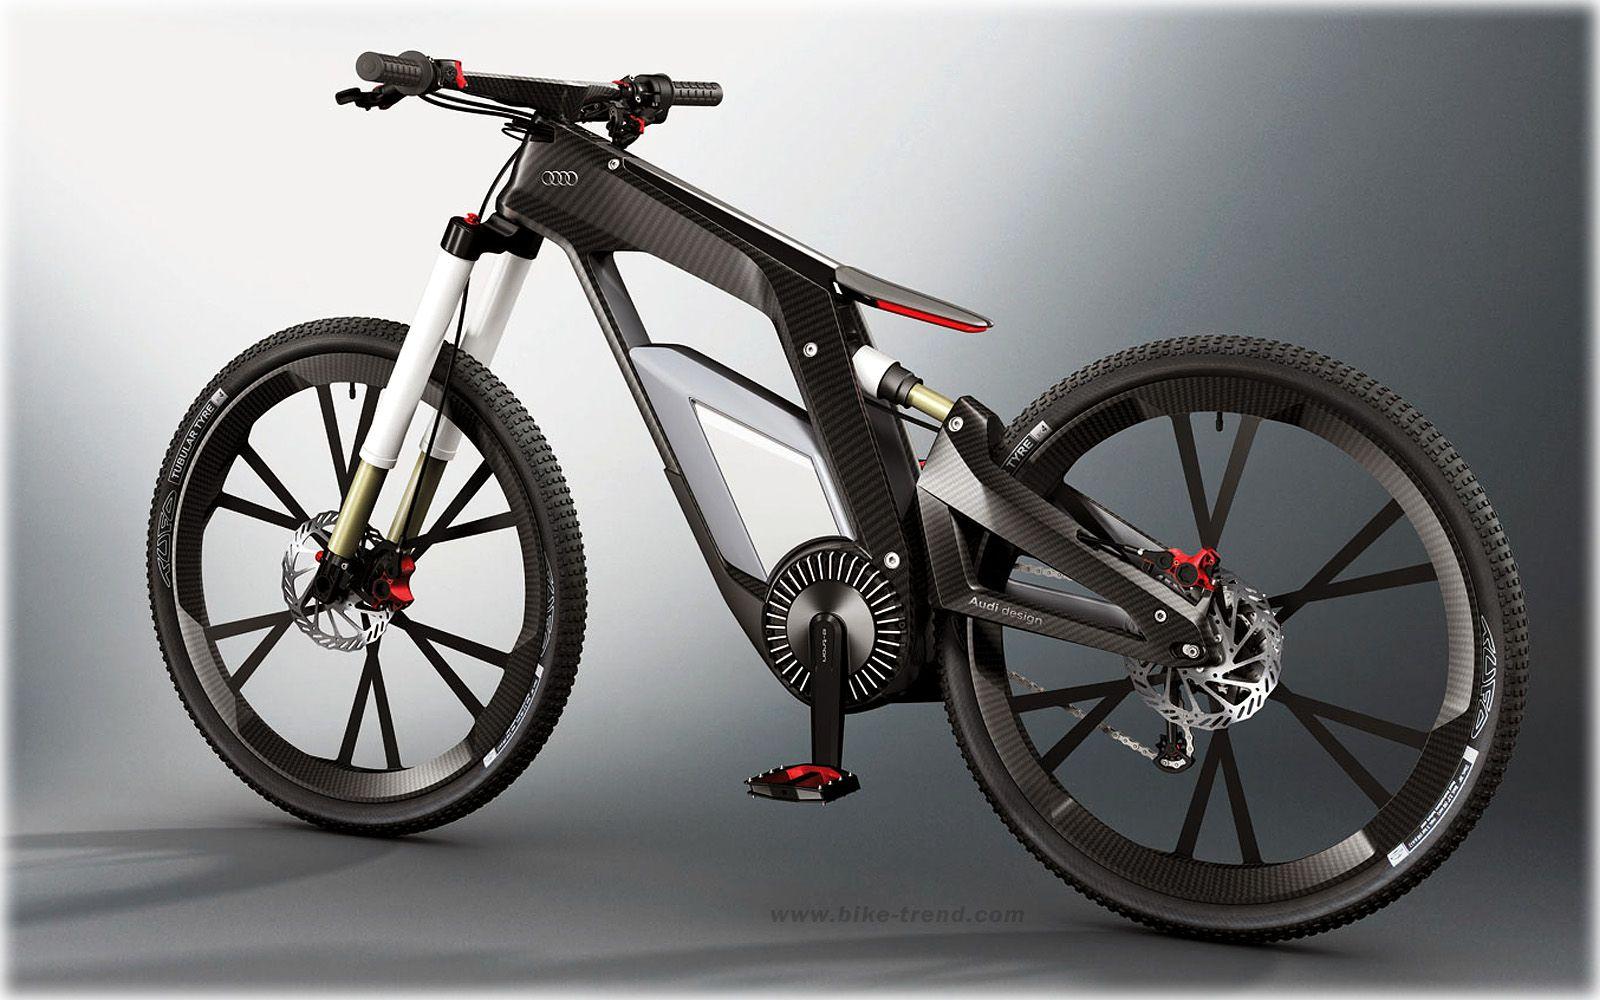 Audi E-Bike Price | Audi E-Bike Concept (2012) electrical bicycle ...